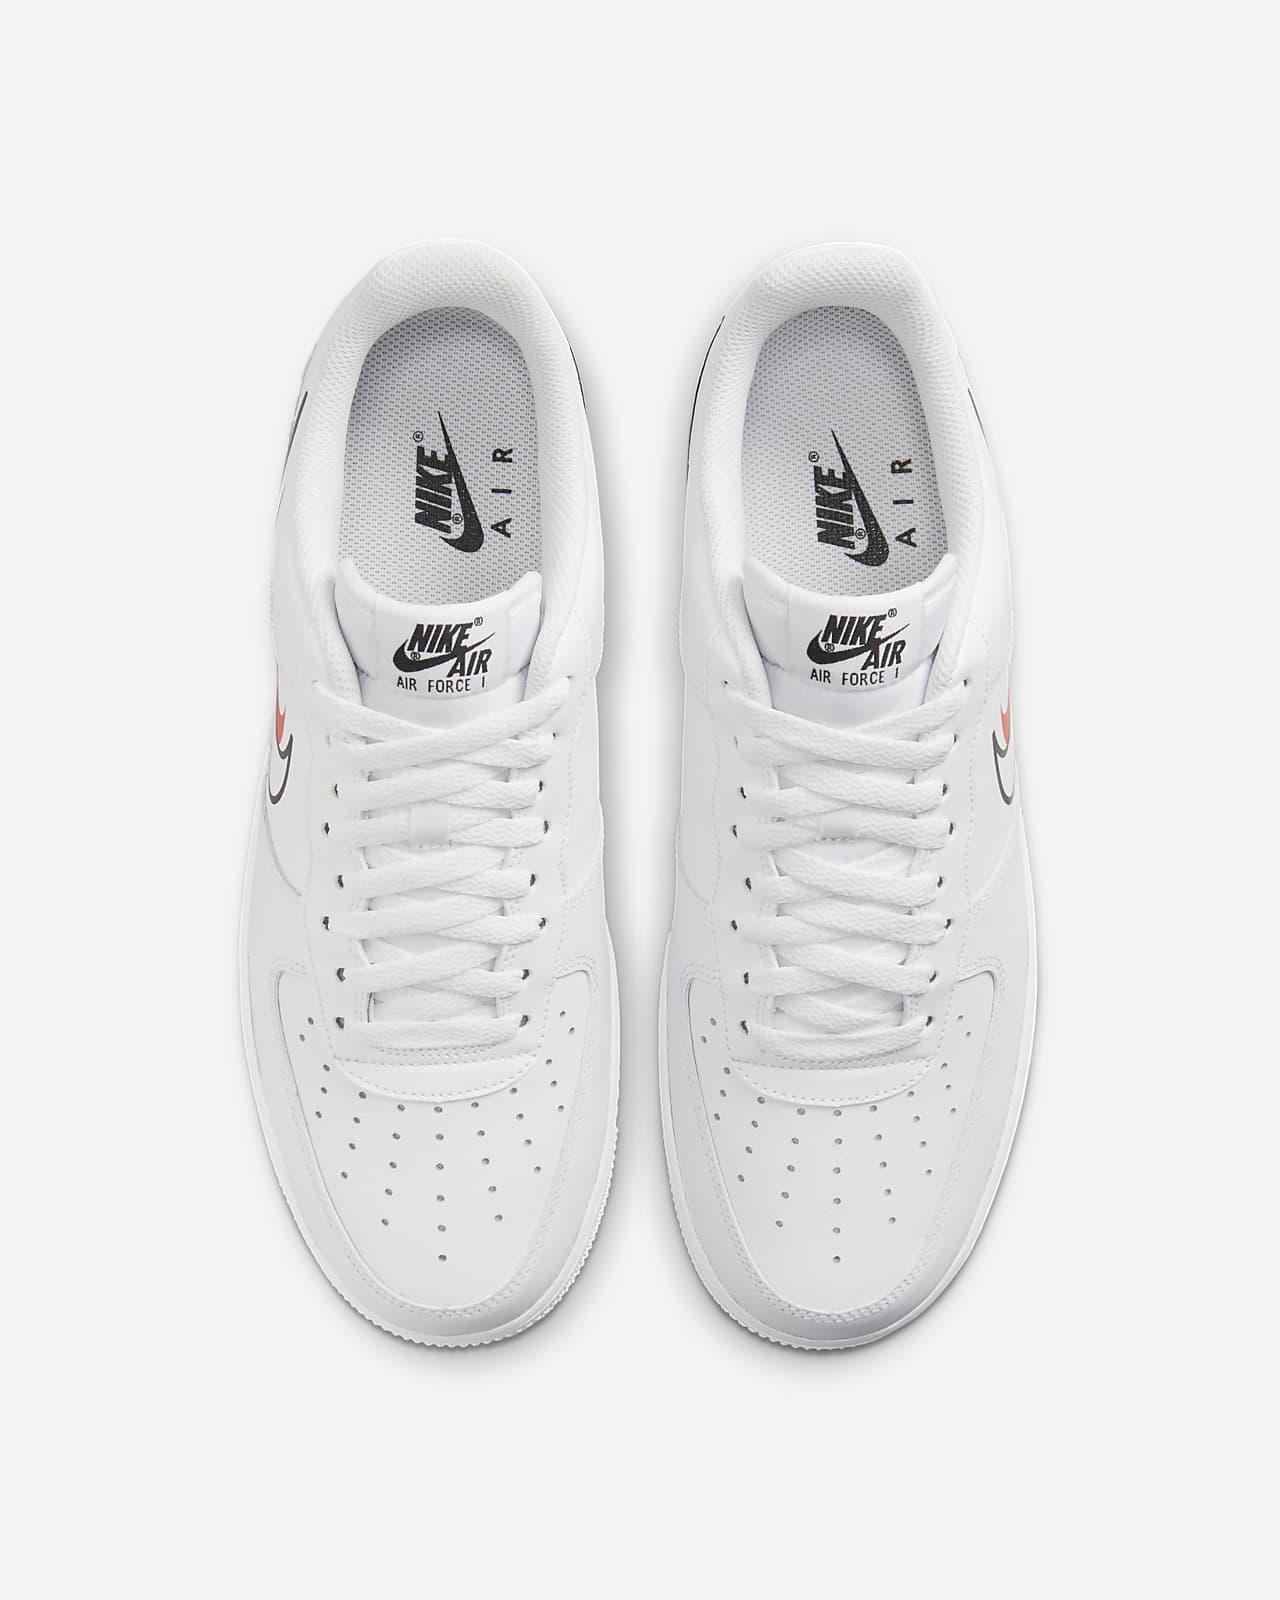 Nike Air Force 1 Men's Shoes. Nike LU